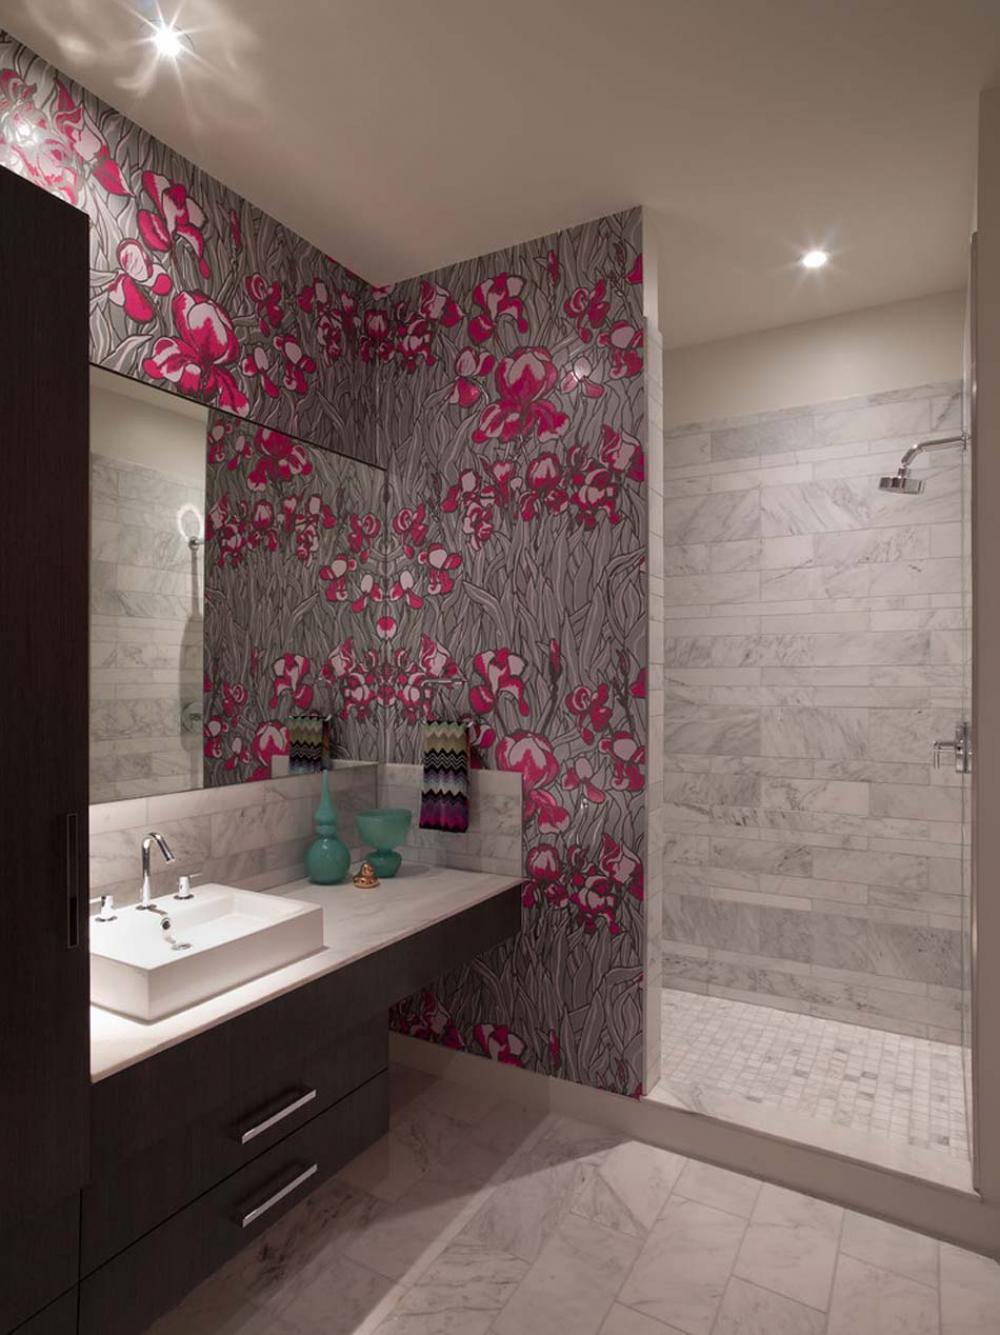 Обои в туалете розовые